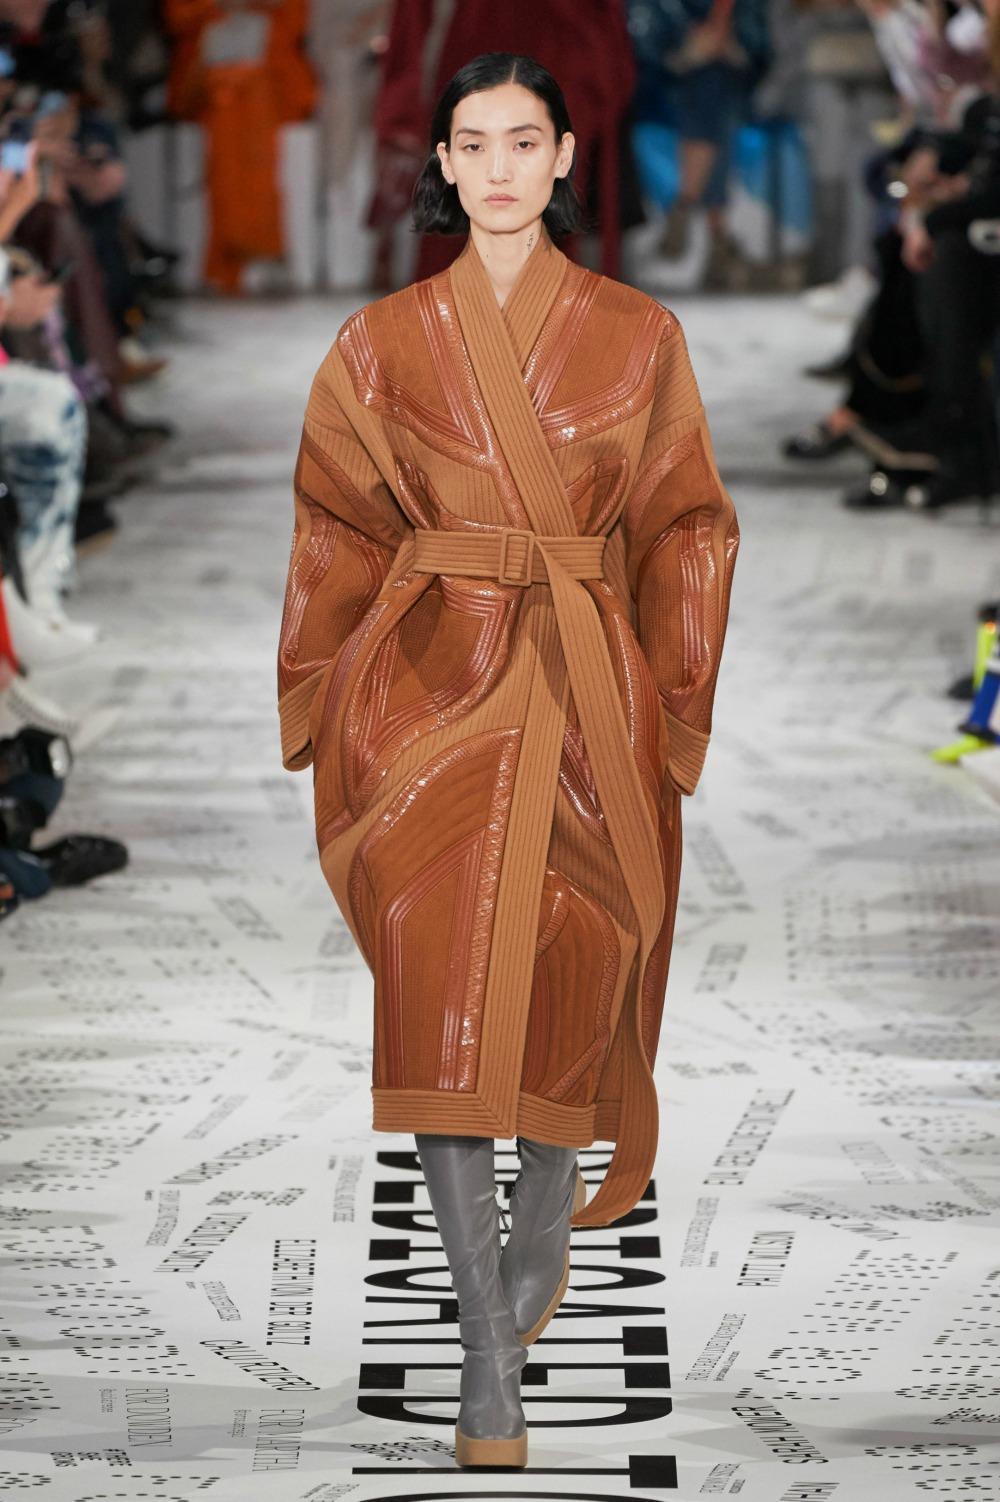 Best Paris Fashion Week Looks -Stella McCartney Fall 2019 Runway Collection #PFW #FashionWeek